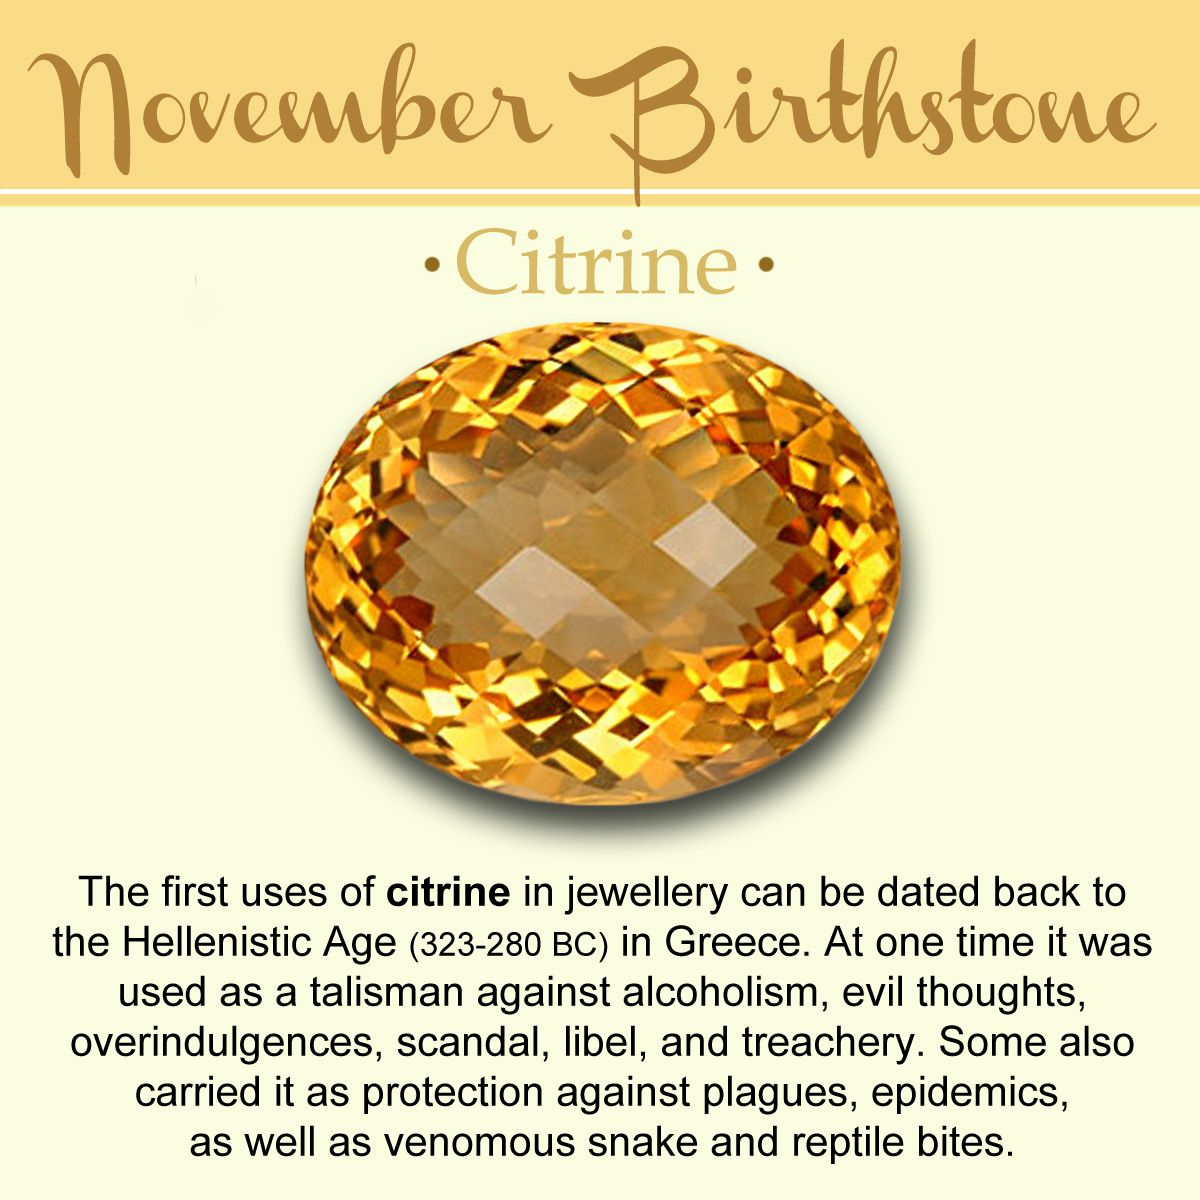 November Birthstone Citrine Meaning